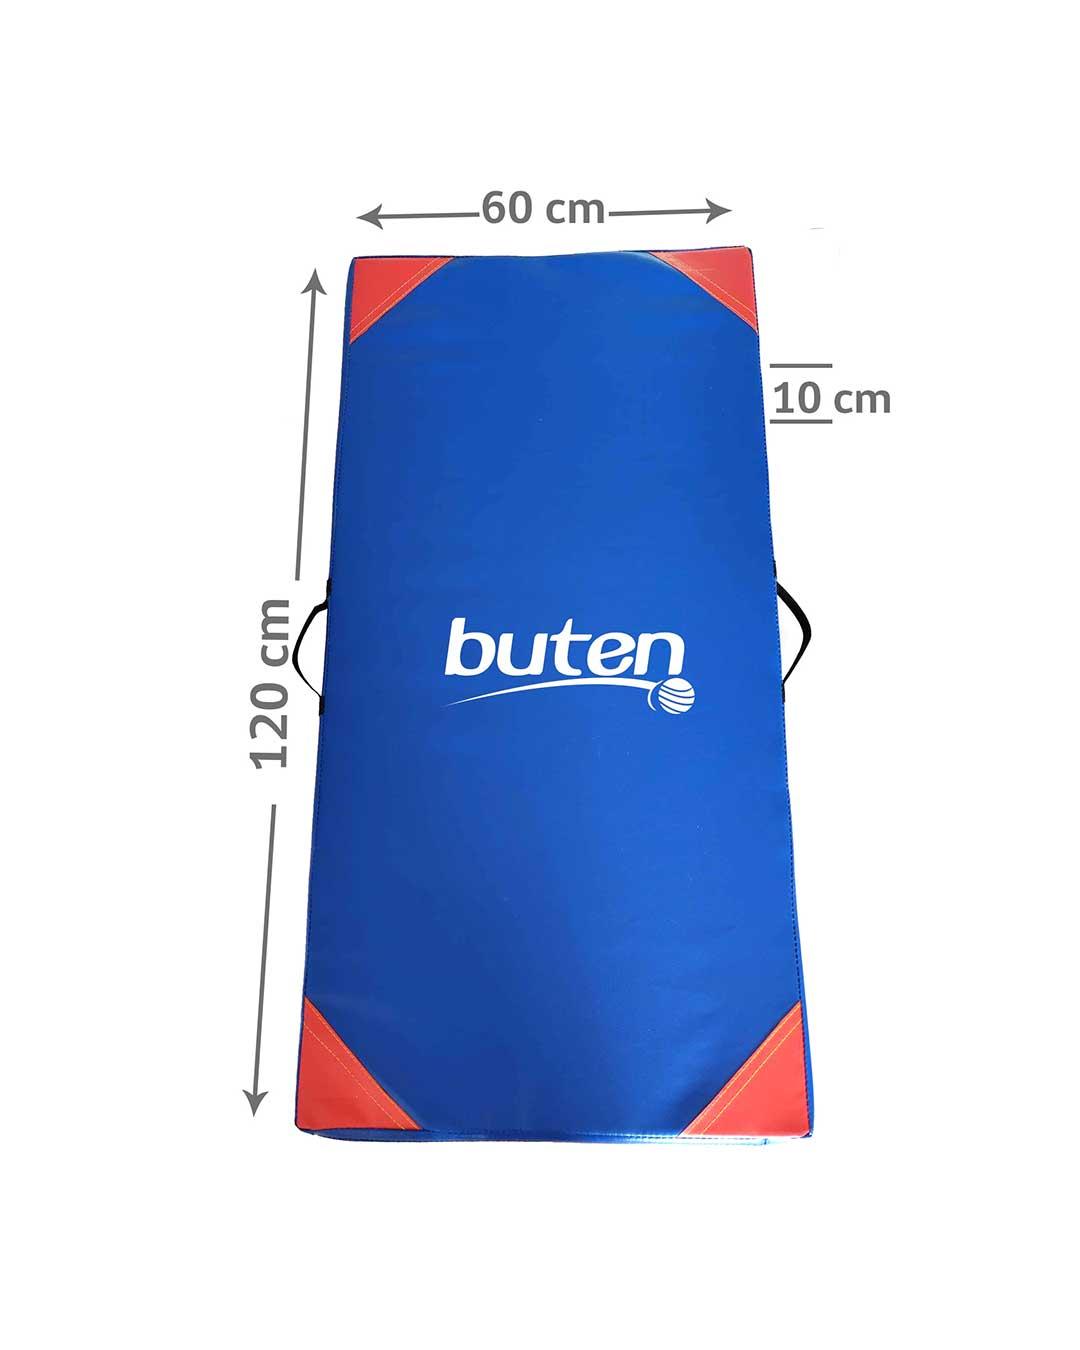 Colchoneta Multiuso (120x60x10cm) marca BUTEN - PU - Chile